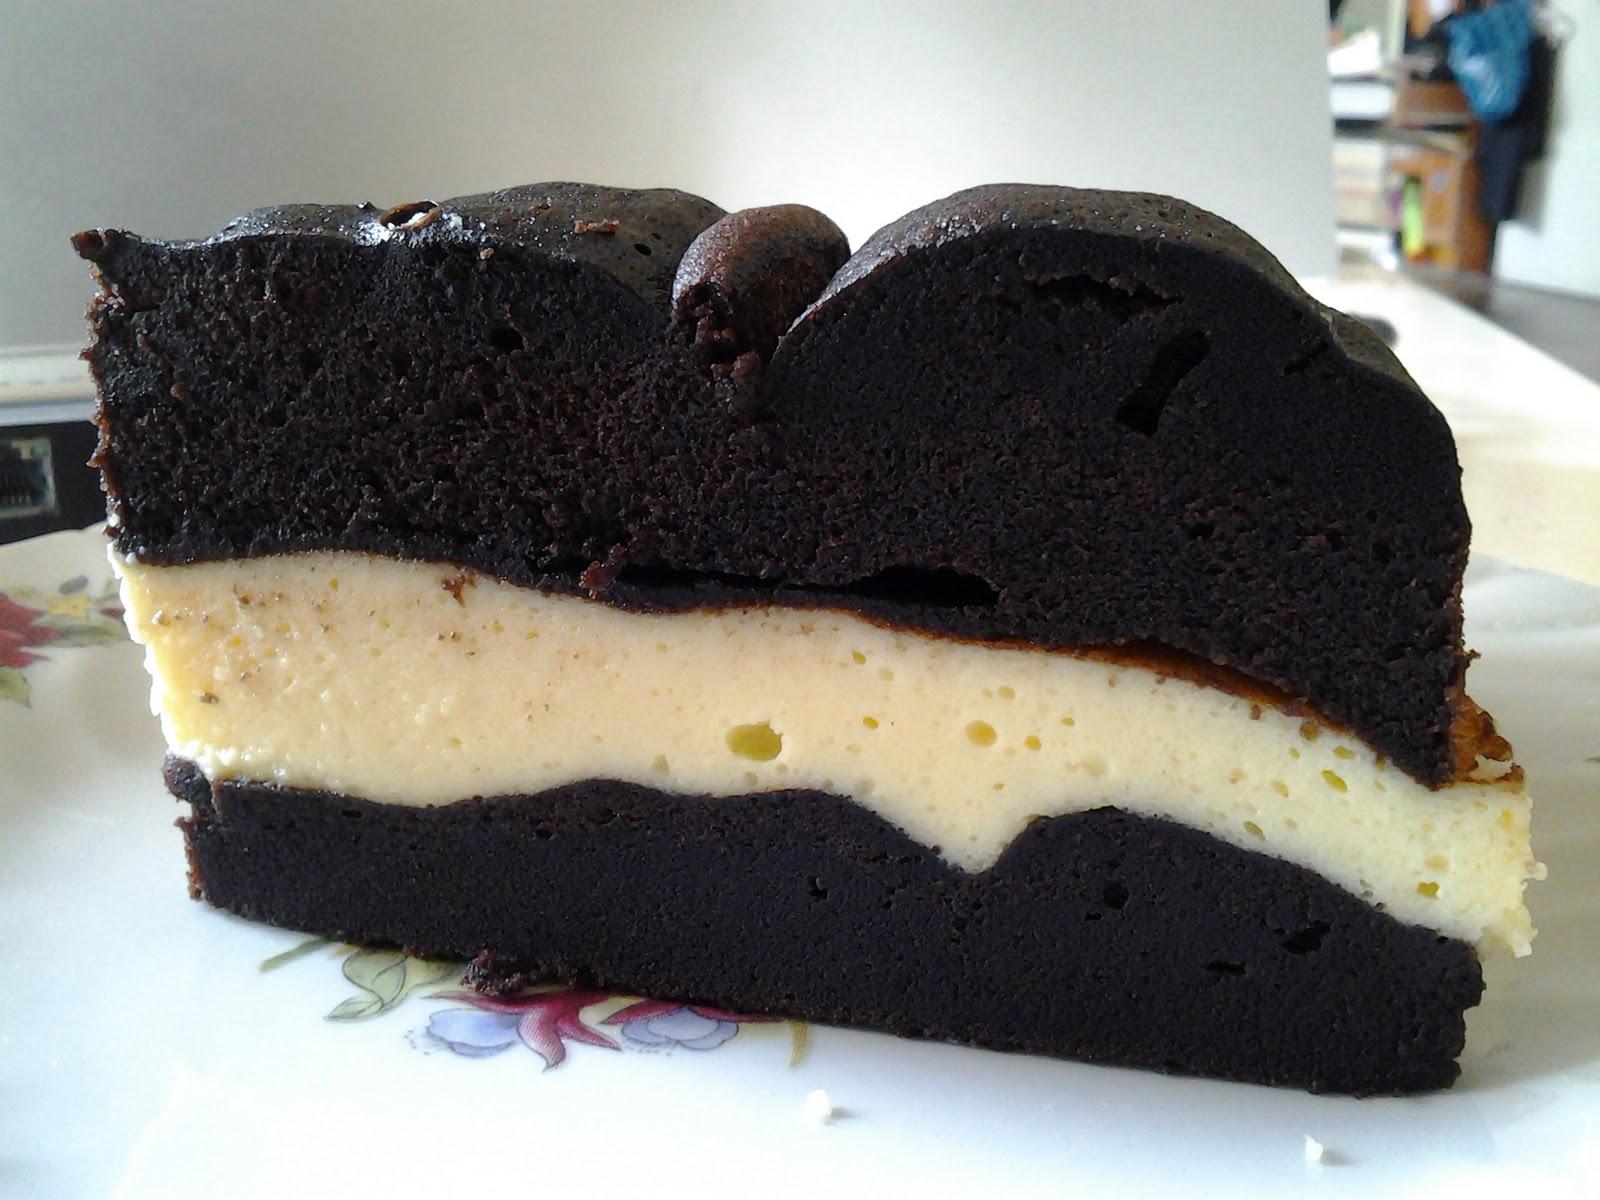 healthy living .......: kek kukus coklat cheese ............